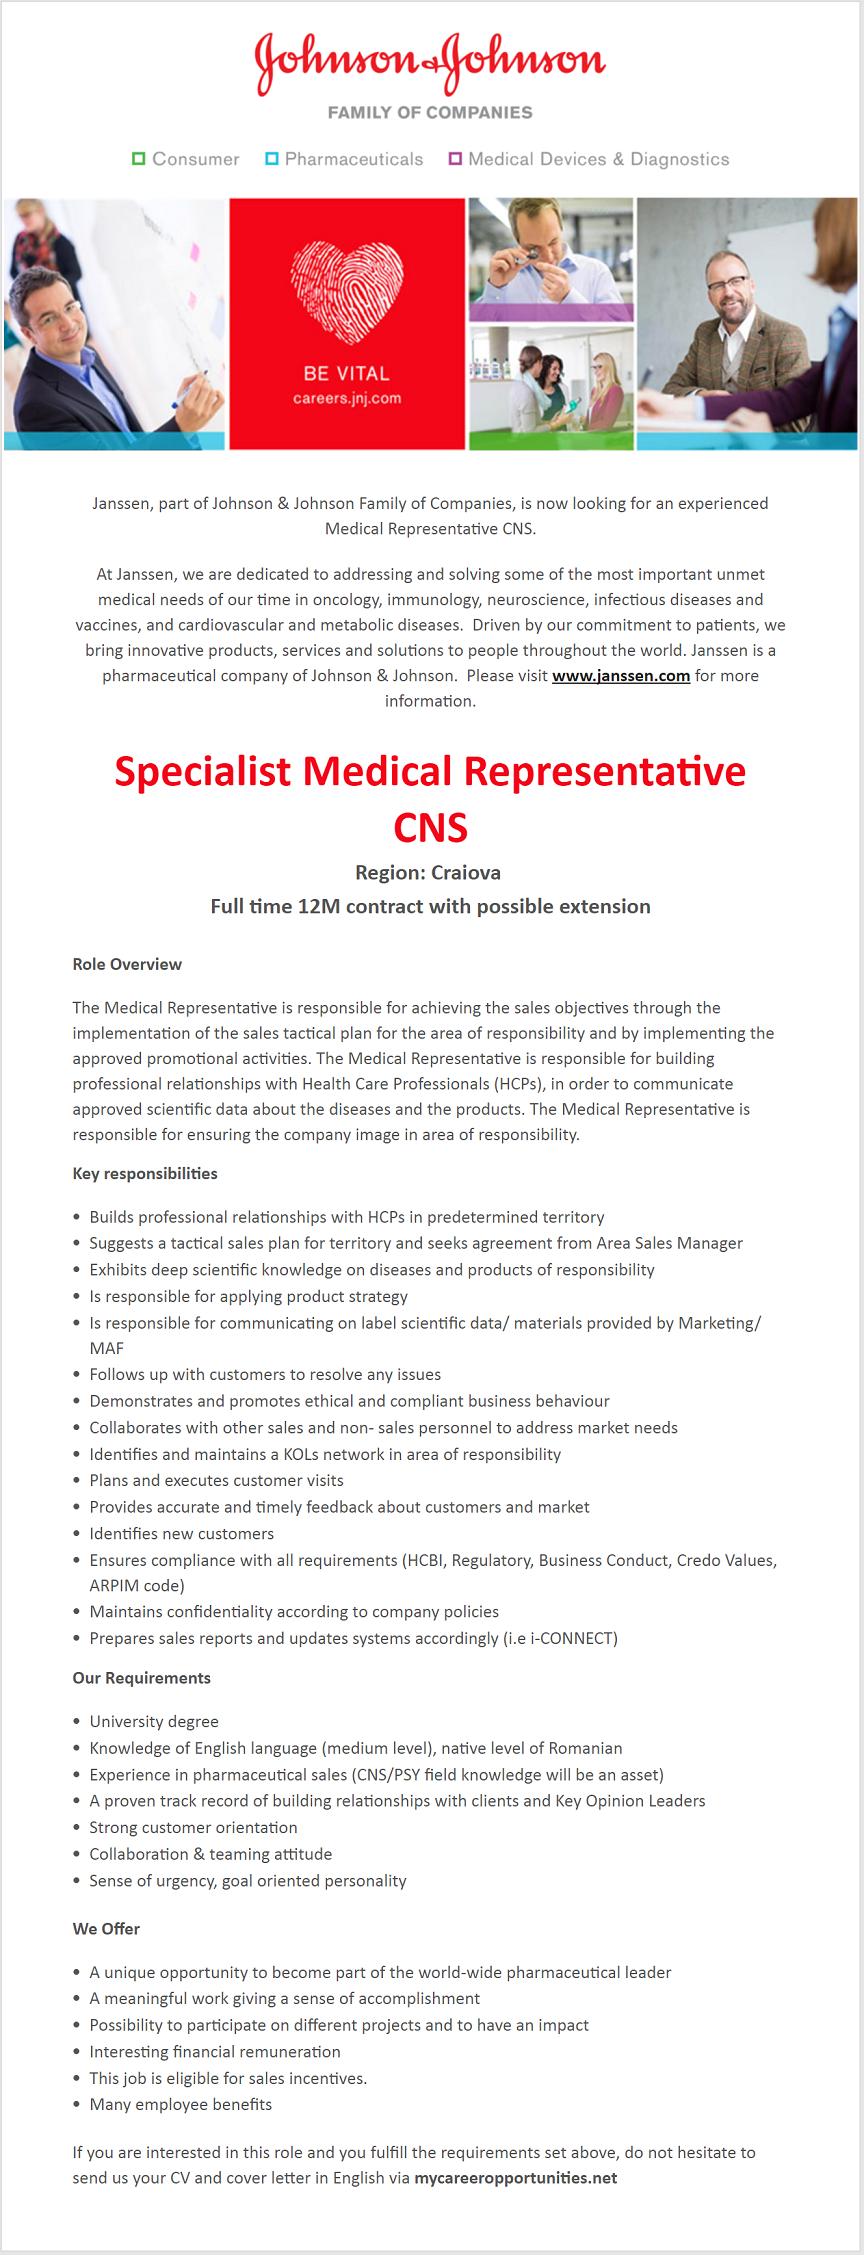 how to become a medical representative